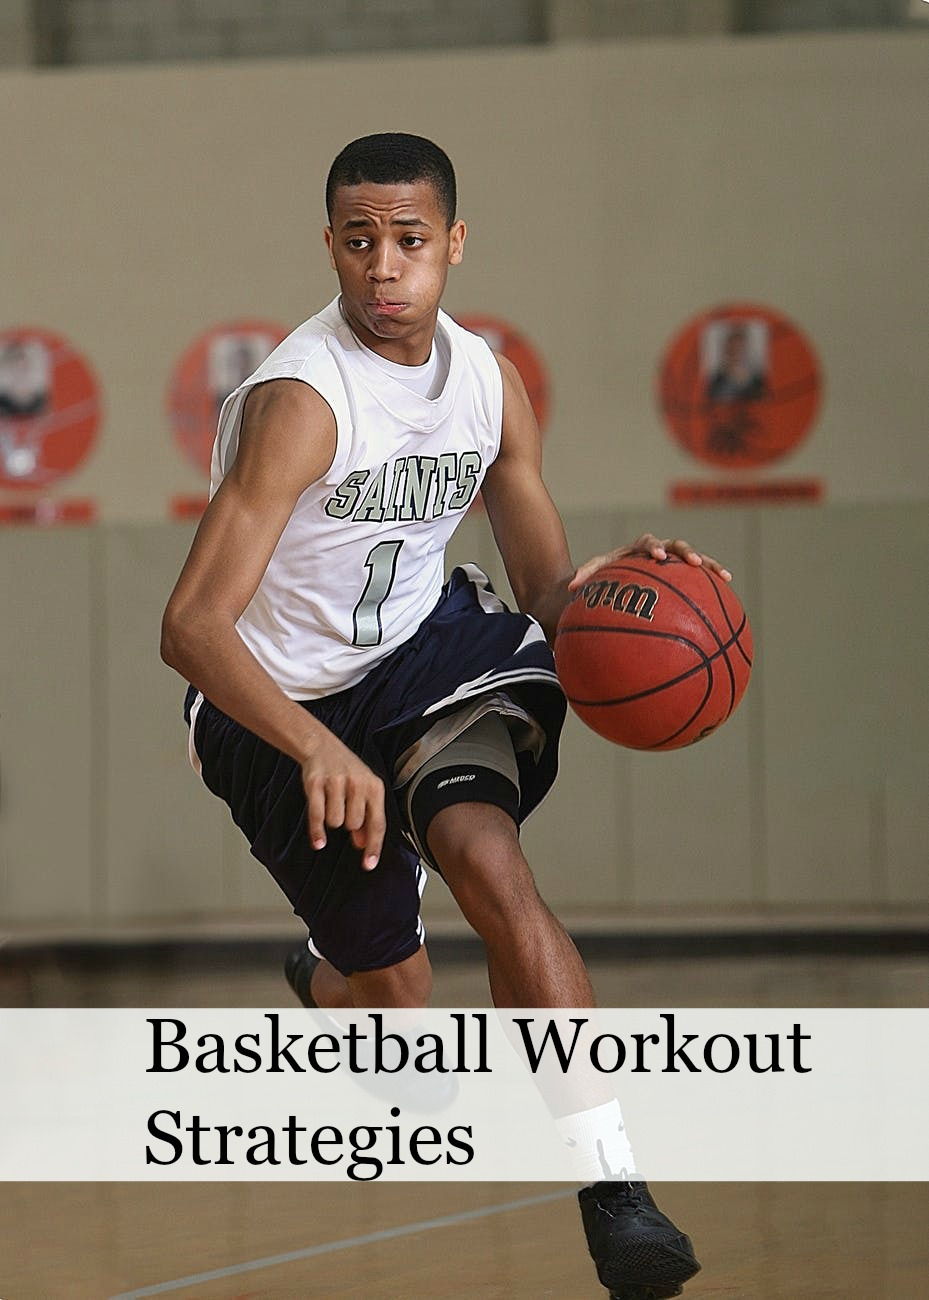 Basketball Workout Strategies